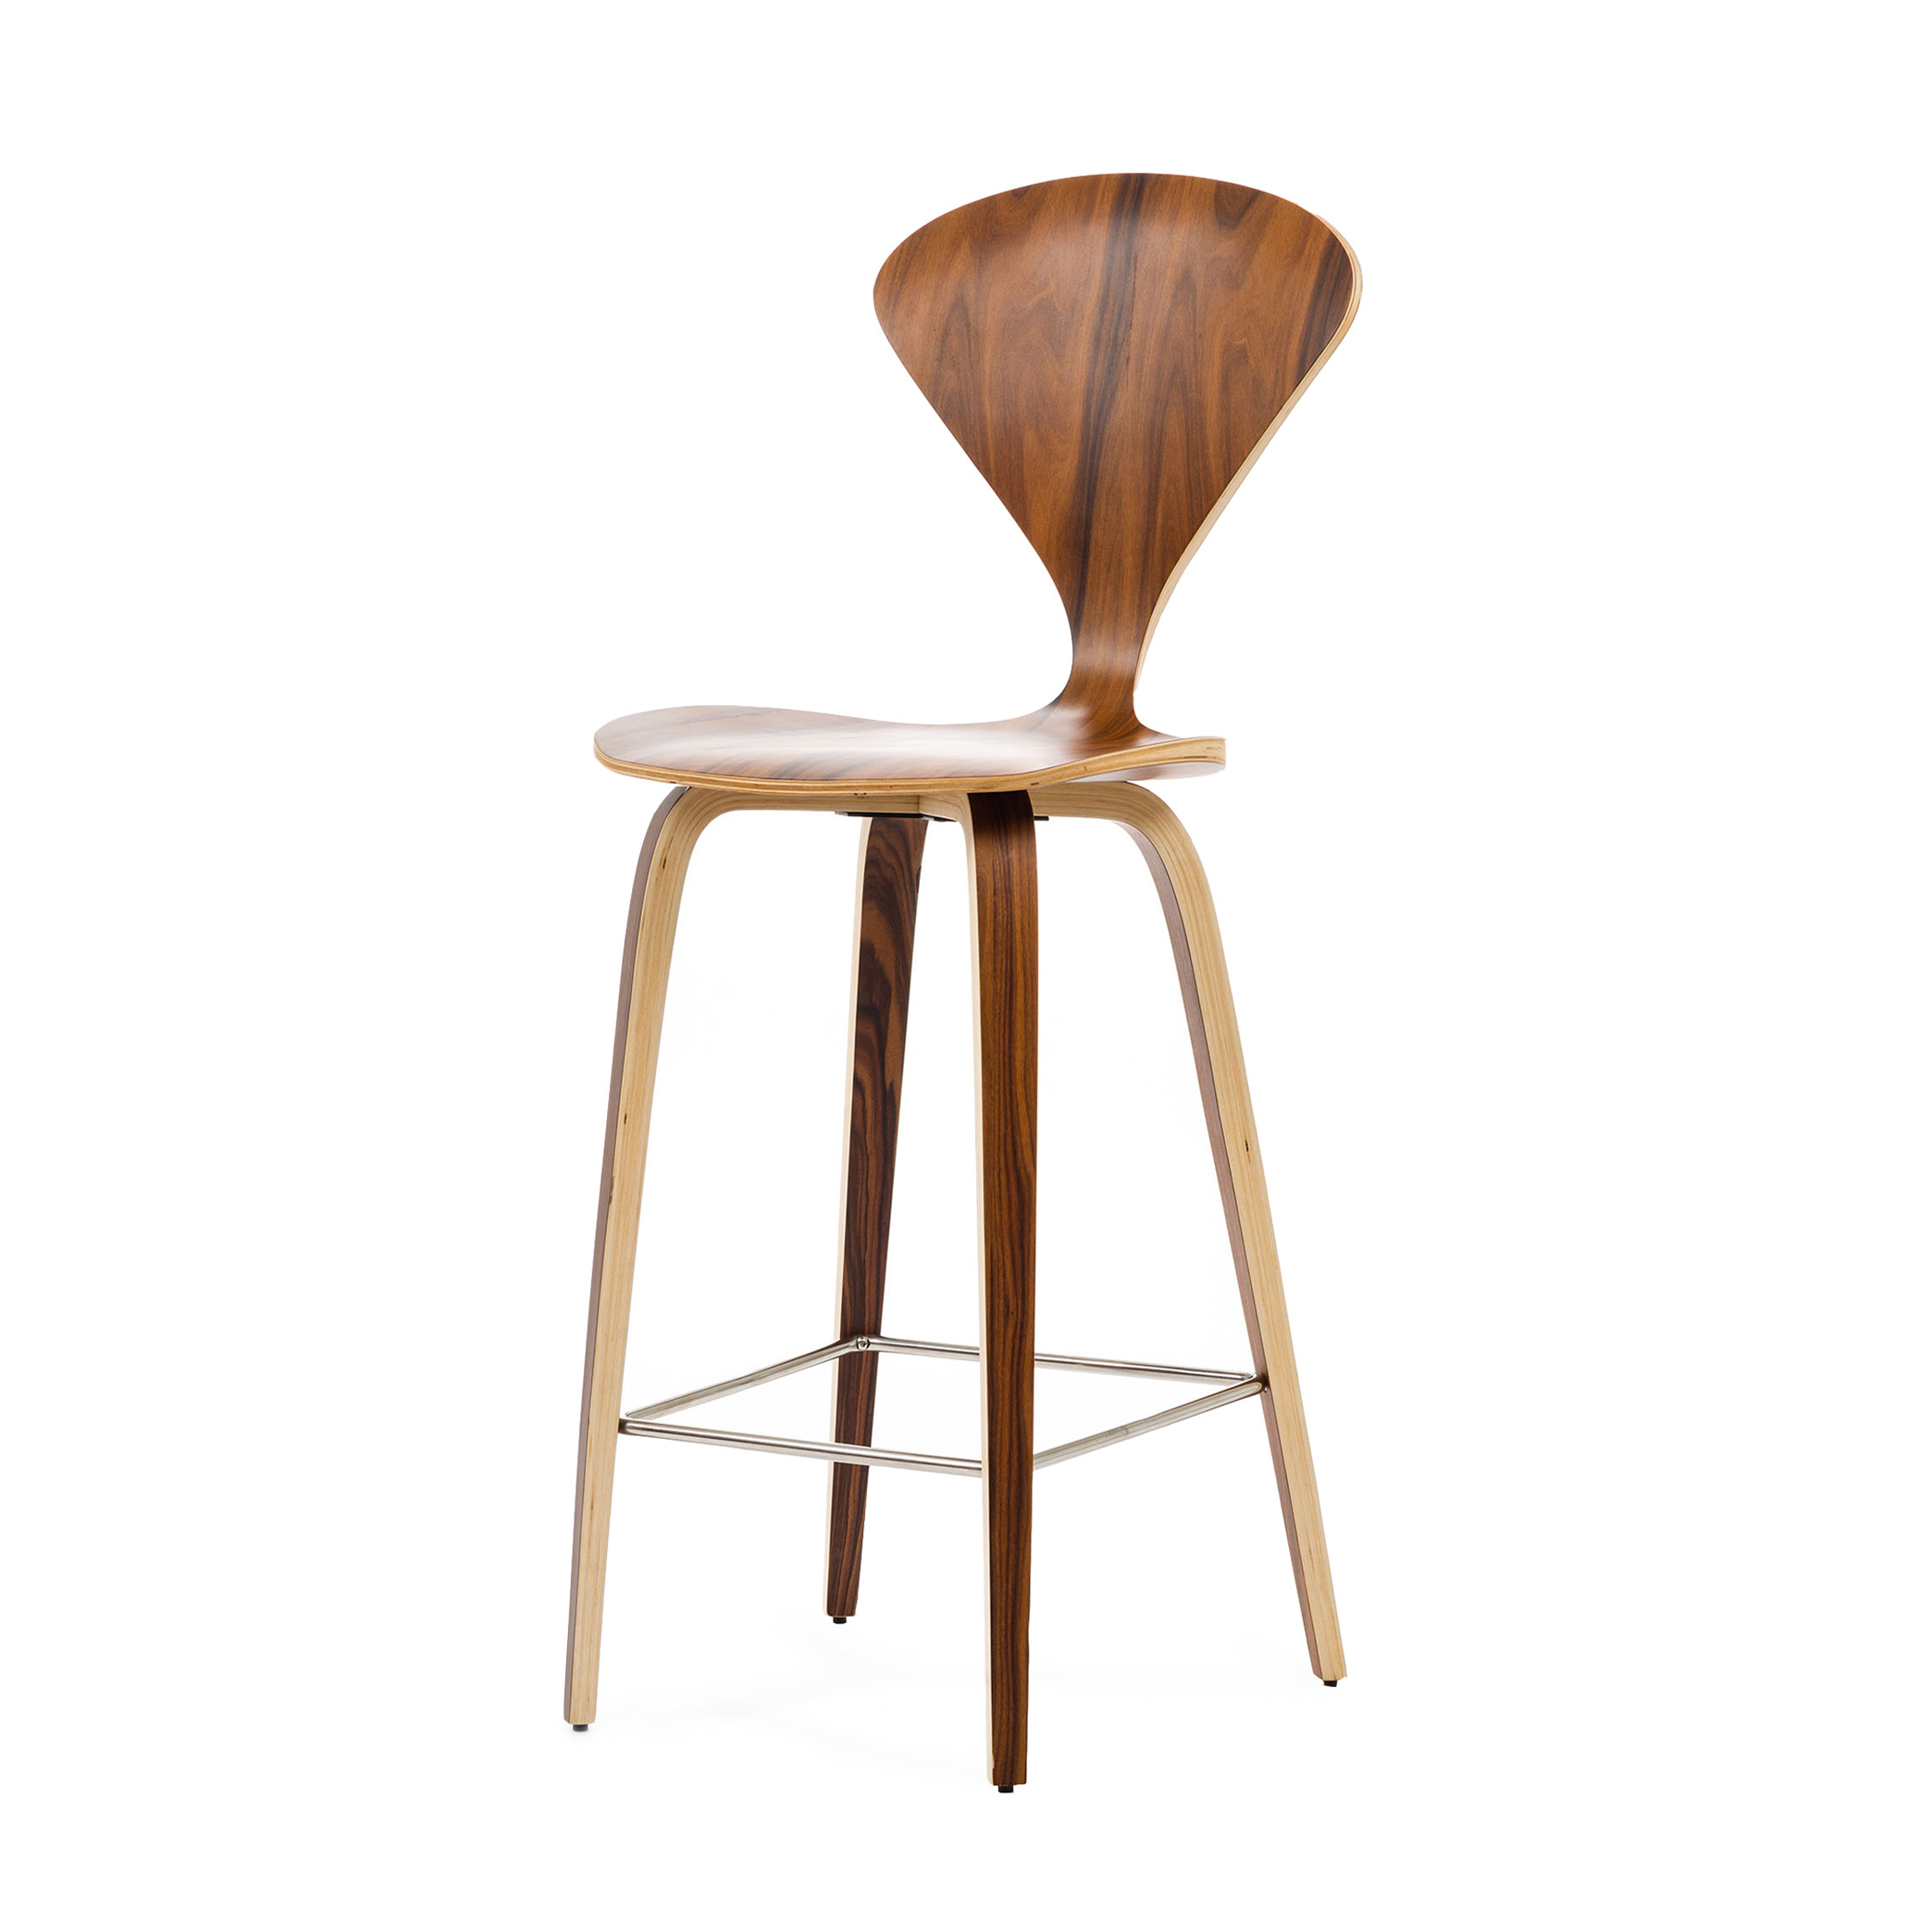 Барный стул Cherner высота 110 стул барный cosmo cherner